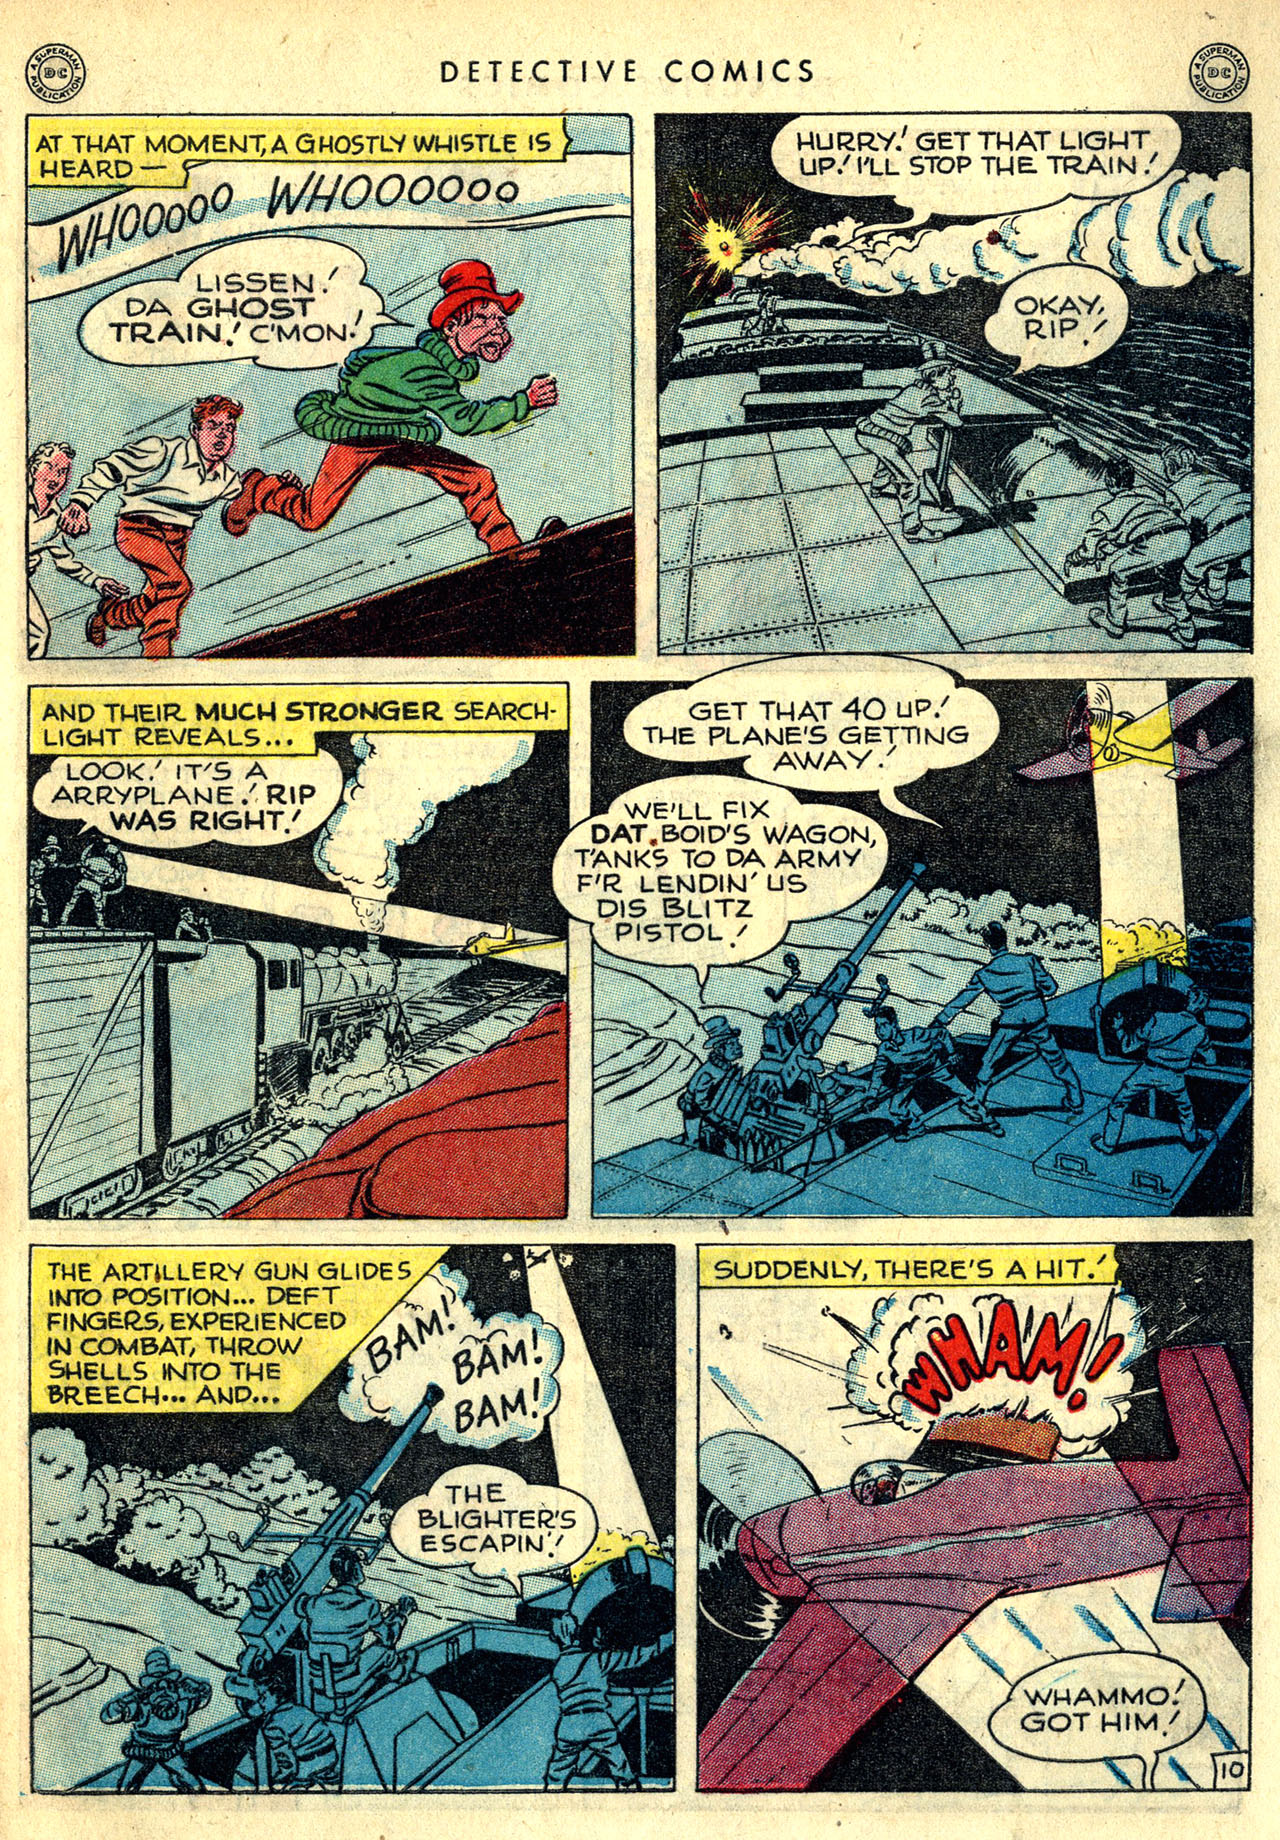 Detective Comics (1937) 121 Page 46